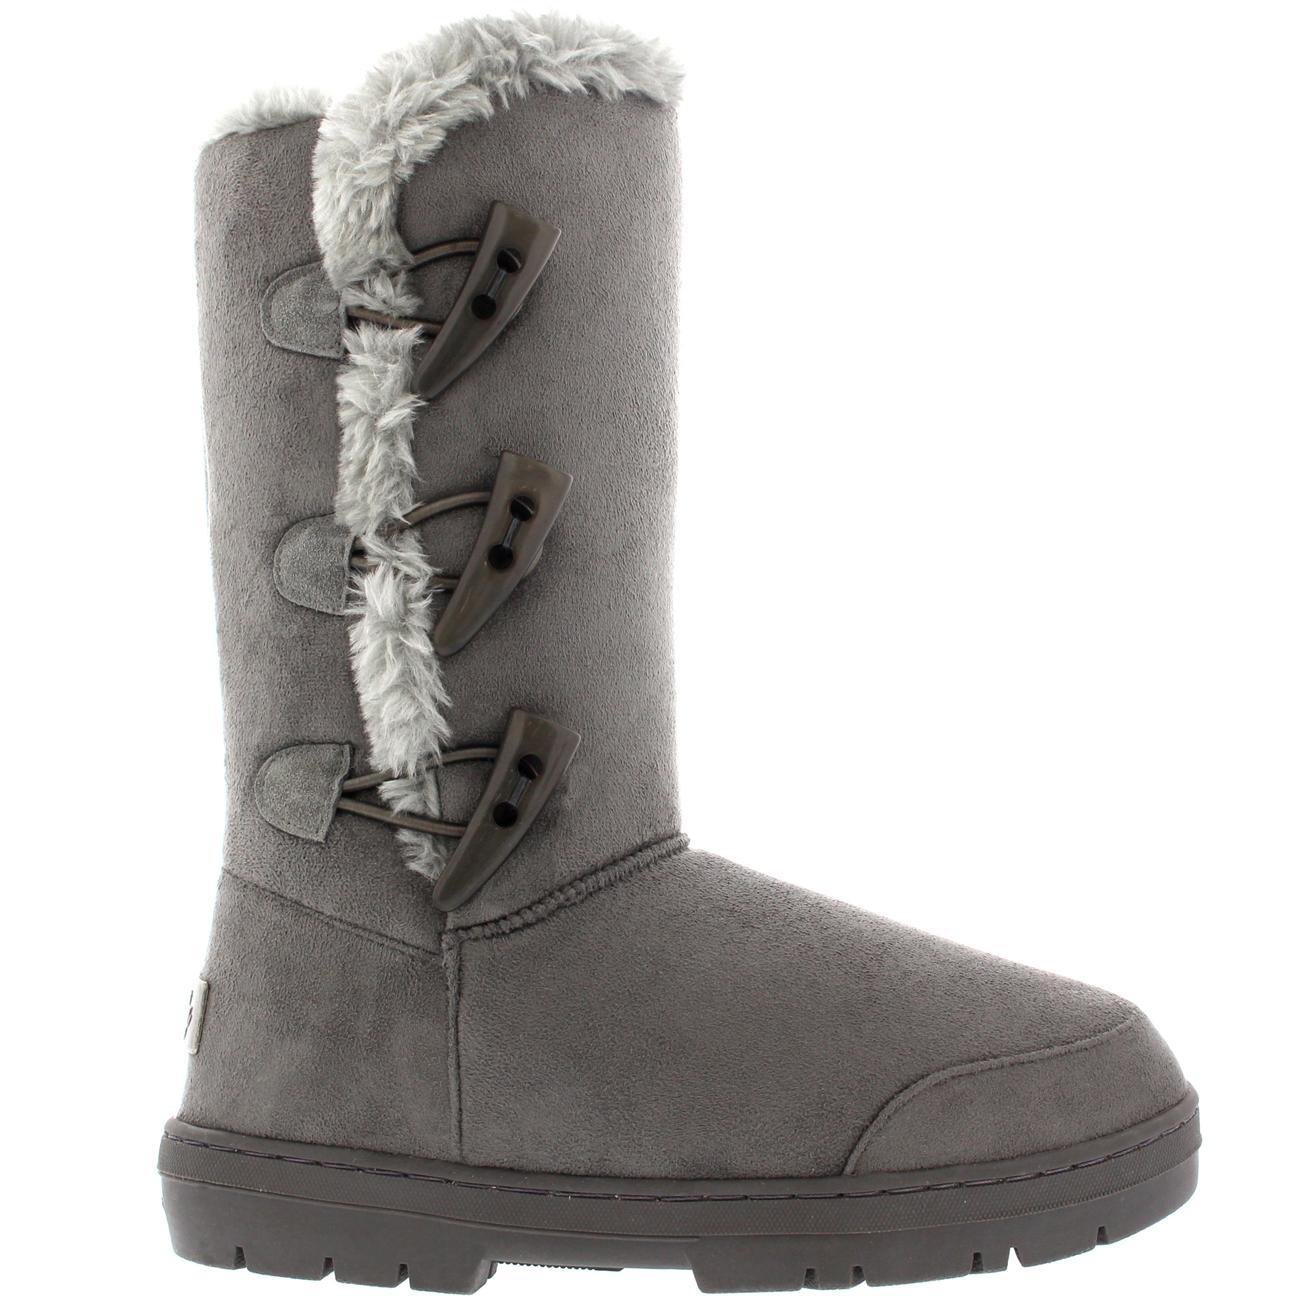 womens waterproof snow boots size 11 national sheriffs